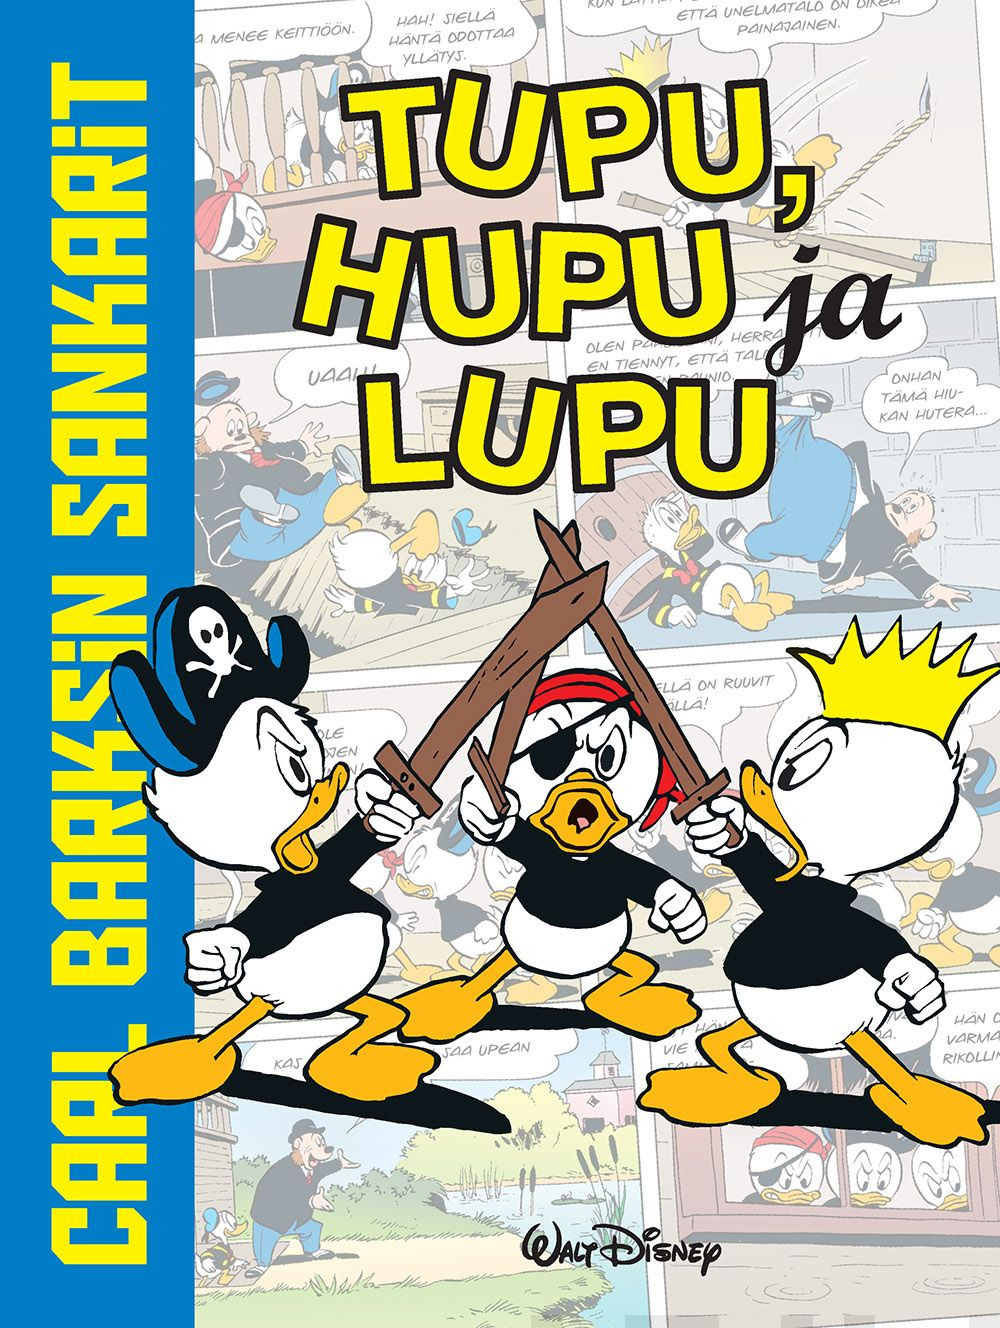 Carl Barksin sankarit - Tupu, Hupu ja Lupu